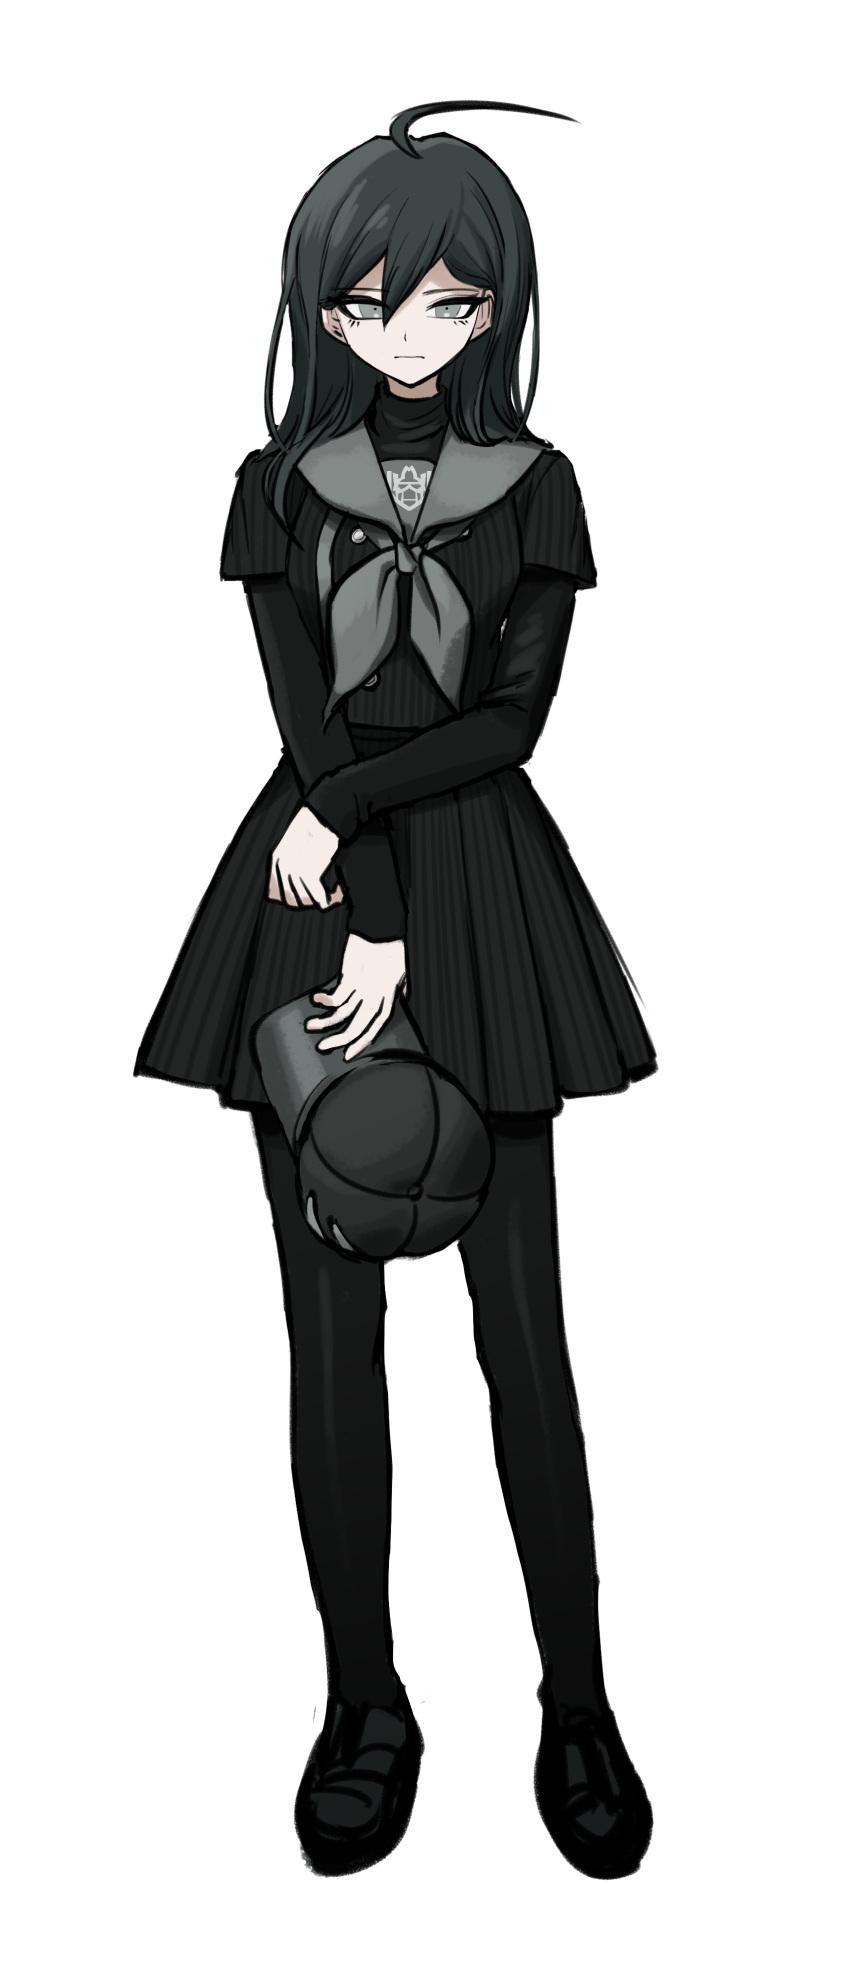 1girl absurdres ahoge bangs black_footwear black_hair black_jacket black_legwear black_skirt brown_eyes buttons dangan_ronpa_(series) dangan_ronpa_v3:_killing_harmony double-breasted full_body genderswap genderswap_(mtf) hair_between_eyes hat headwear_removed highres holding holding_clothes holding_hat jacket layered_sleeves long_hair long_sleeves looking_at_viewer no_(xpxz7347) pantyhose pleated_skirt saihara_shuuichi sailor_collar shoes short_over_long_sleeves short_sleeves skirt solo standing striped striped_jacket striped_skirt